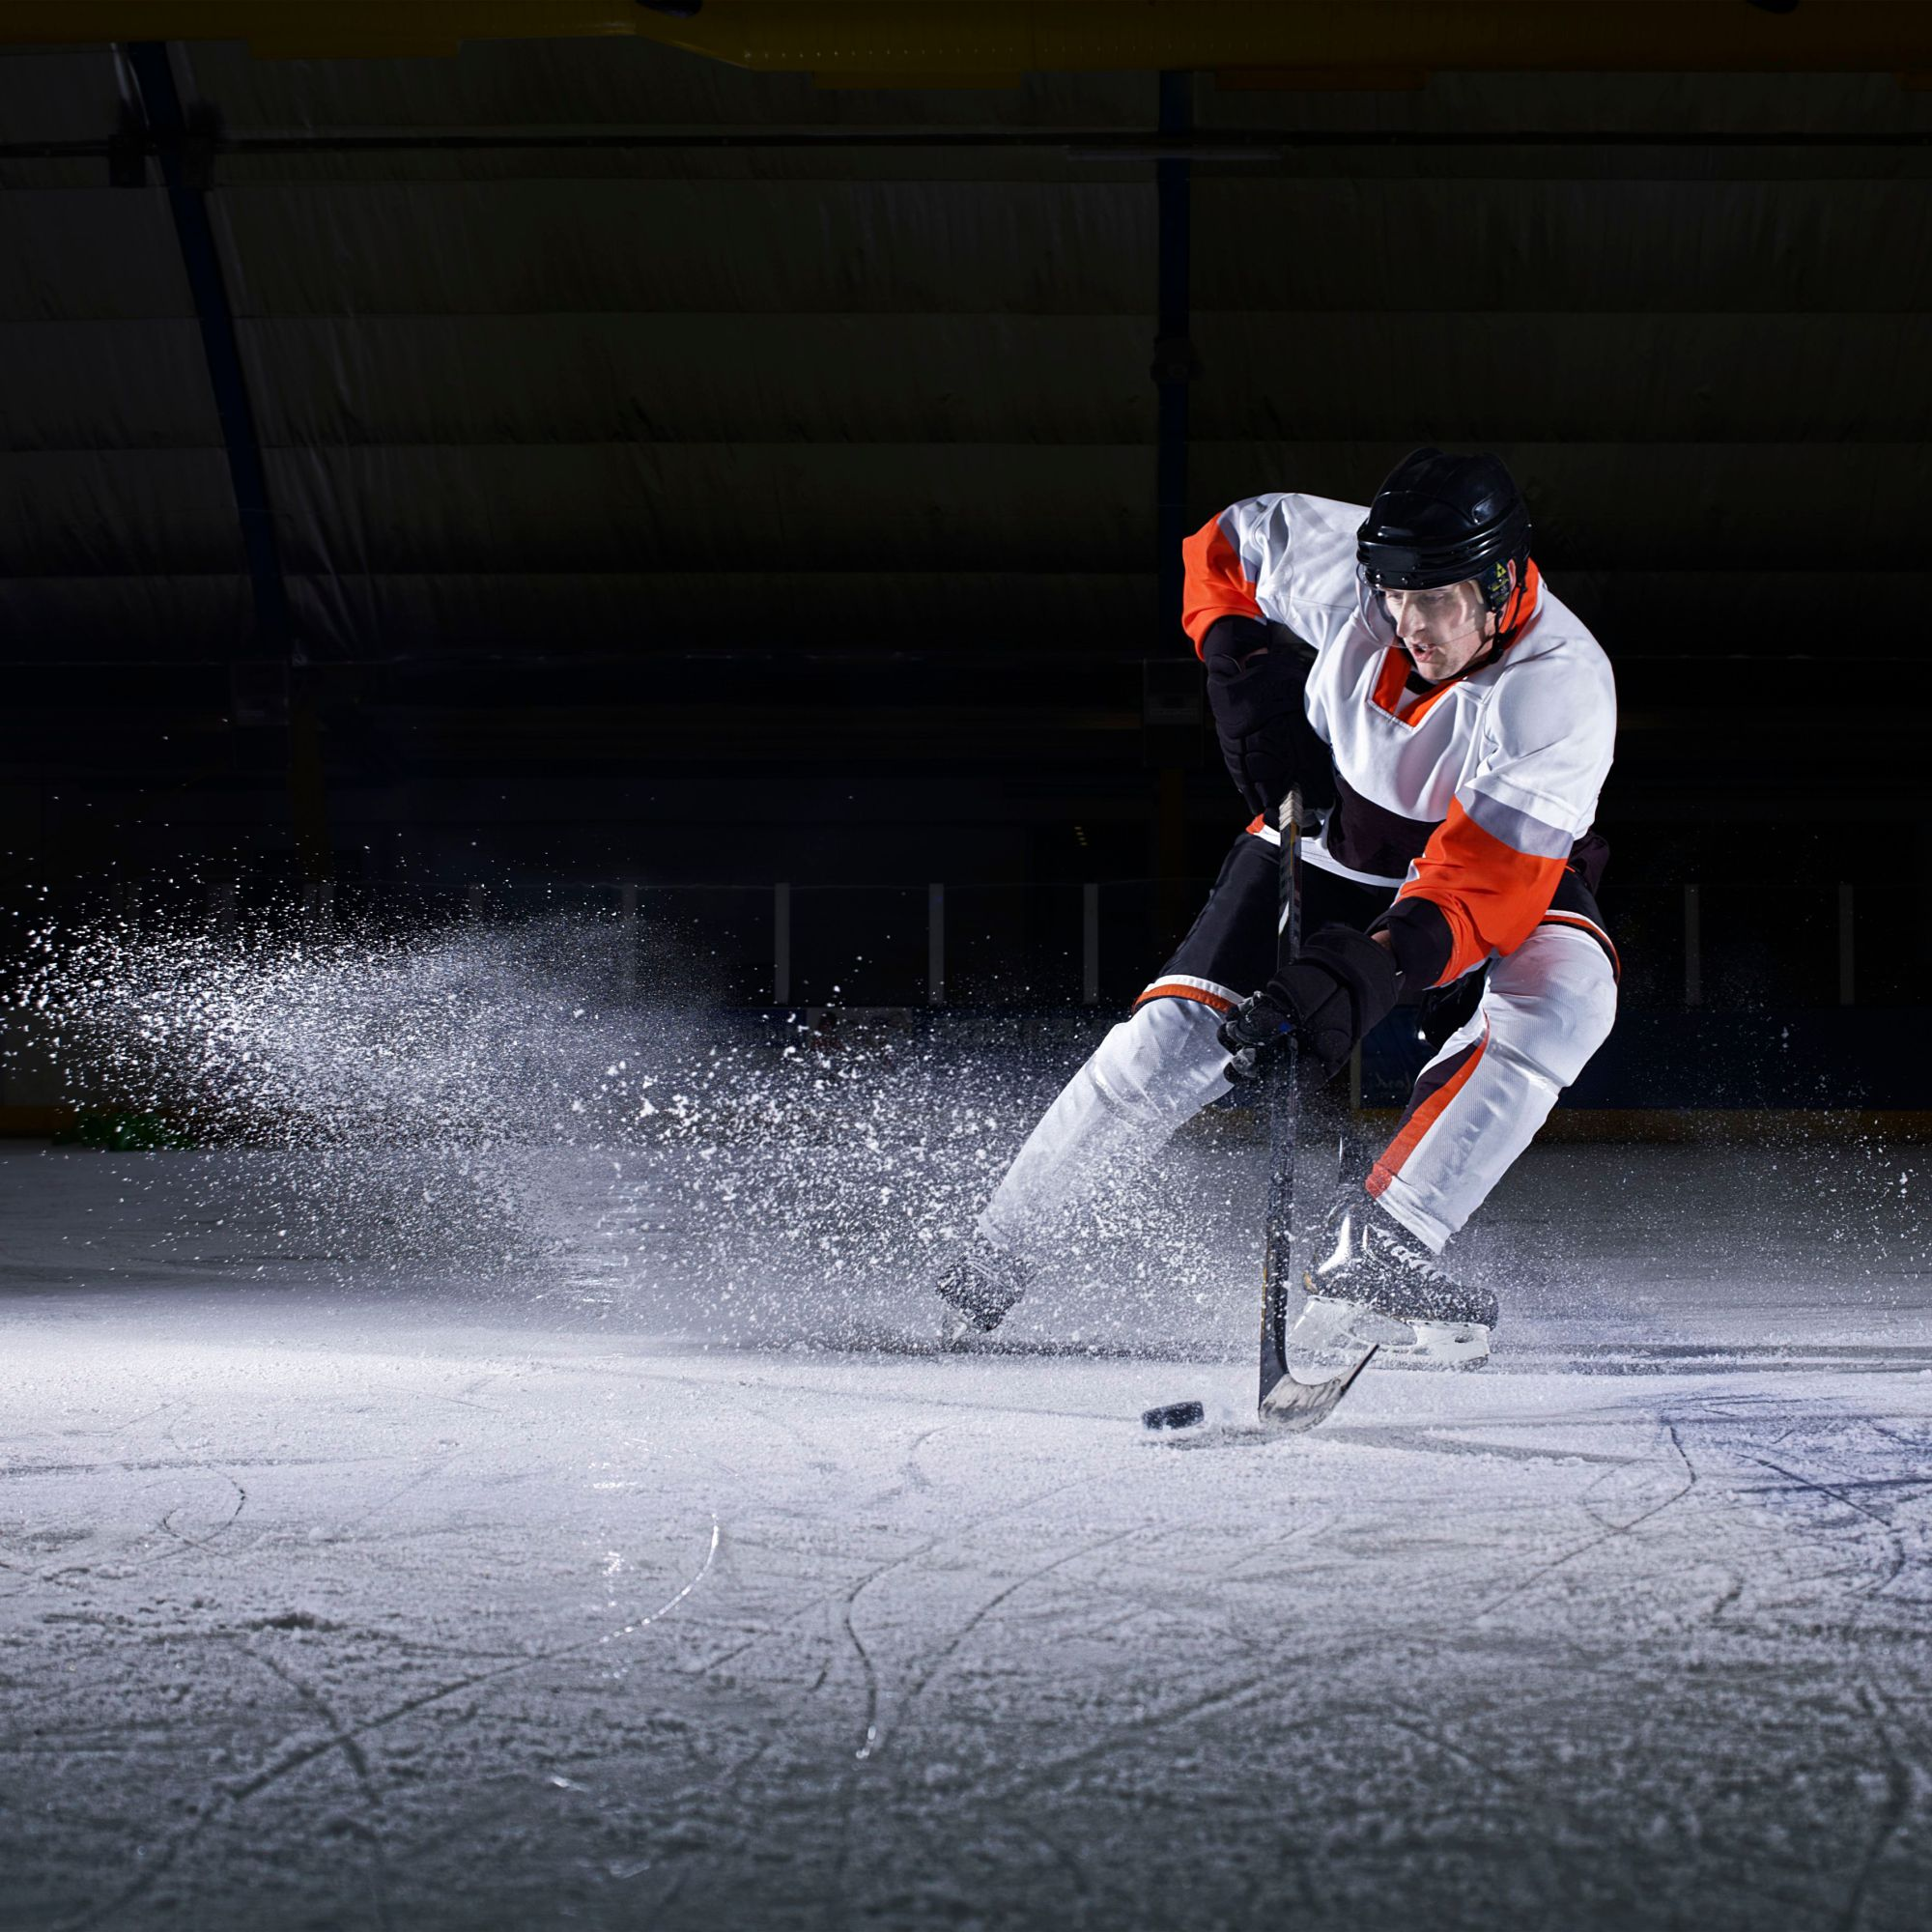 hight resolution of empty hockey rink diagram